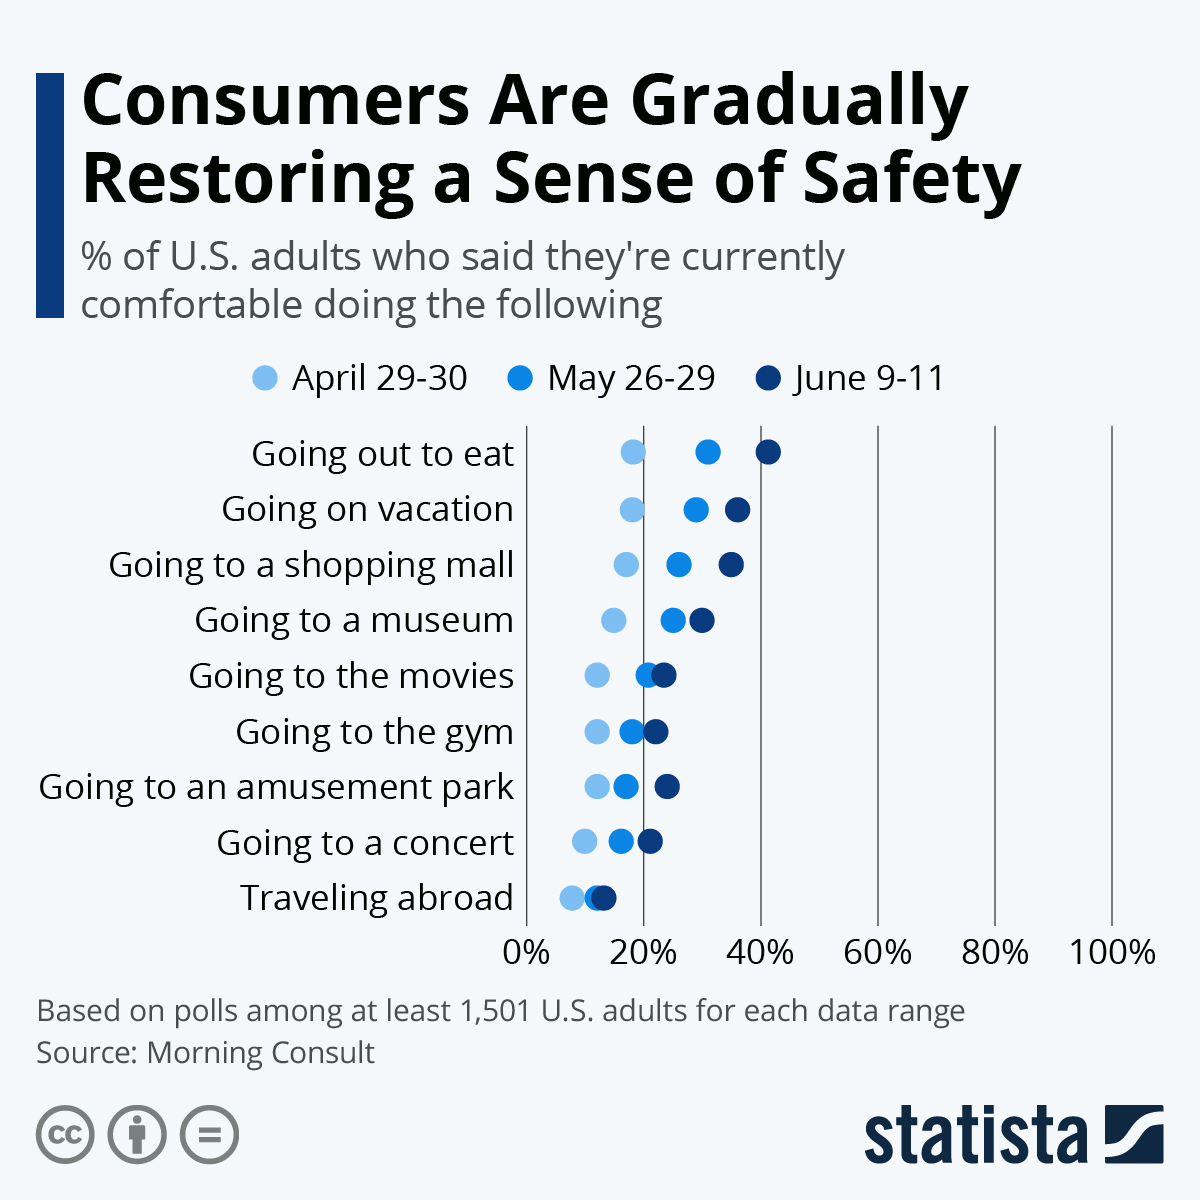 #consumers are really restoring a sense of #safety TY @MorningConsult @enricomolinari #ehealth #mhealth #futureofwork #IoT #fintech #insurtech #STEM   @oxana_zeitler @ZirkusElune @shivon @ZeljkaPotoku @chidambara09 @k_feldborg @StartGrowthHack @HansLak @mirko_ross @S_Galimberti https://t.co/ffIFBVePxu